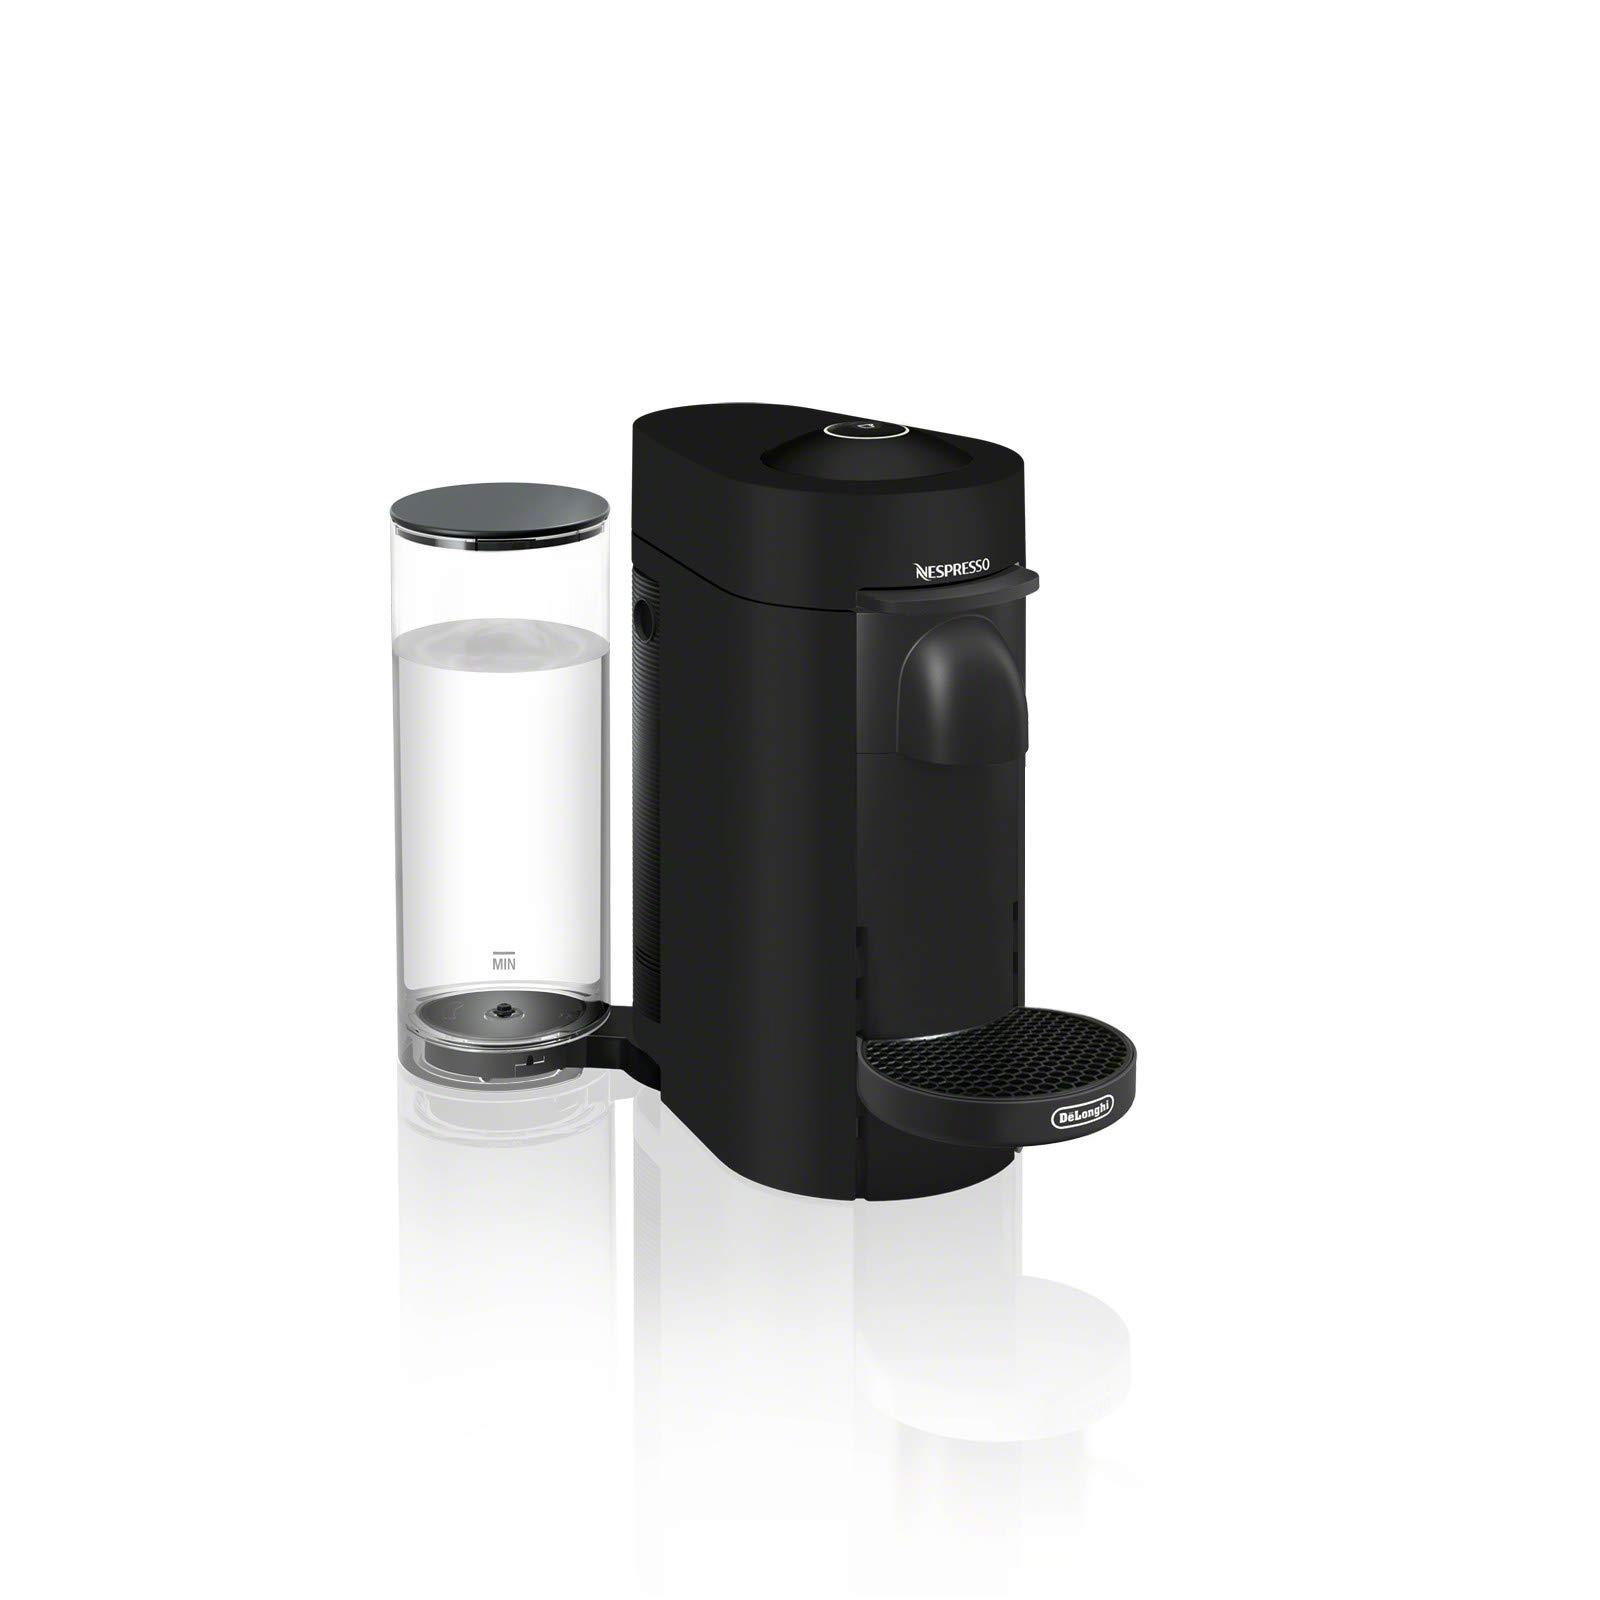 Nespresso by De'Longhi ENV150BM VertuoPlus Coffee and Espresso Machine by De'Longhi, Black Matte by Nespresso by De'Longhi